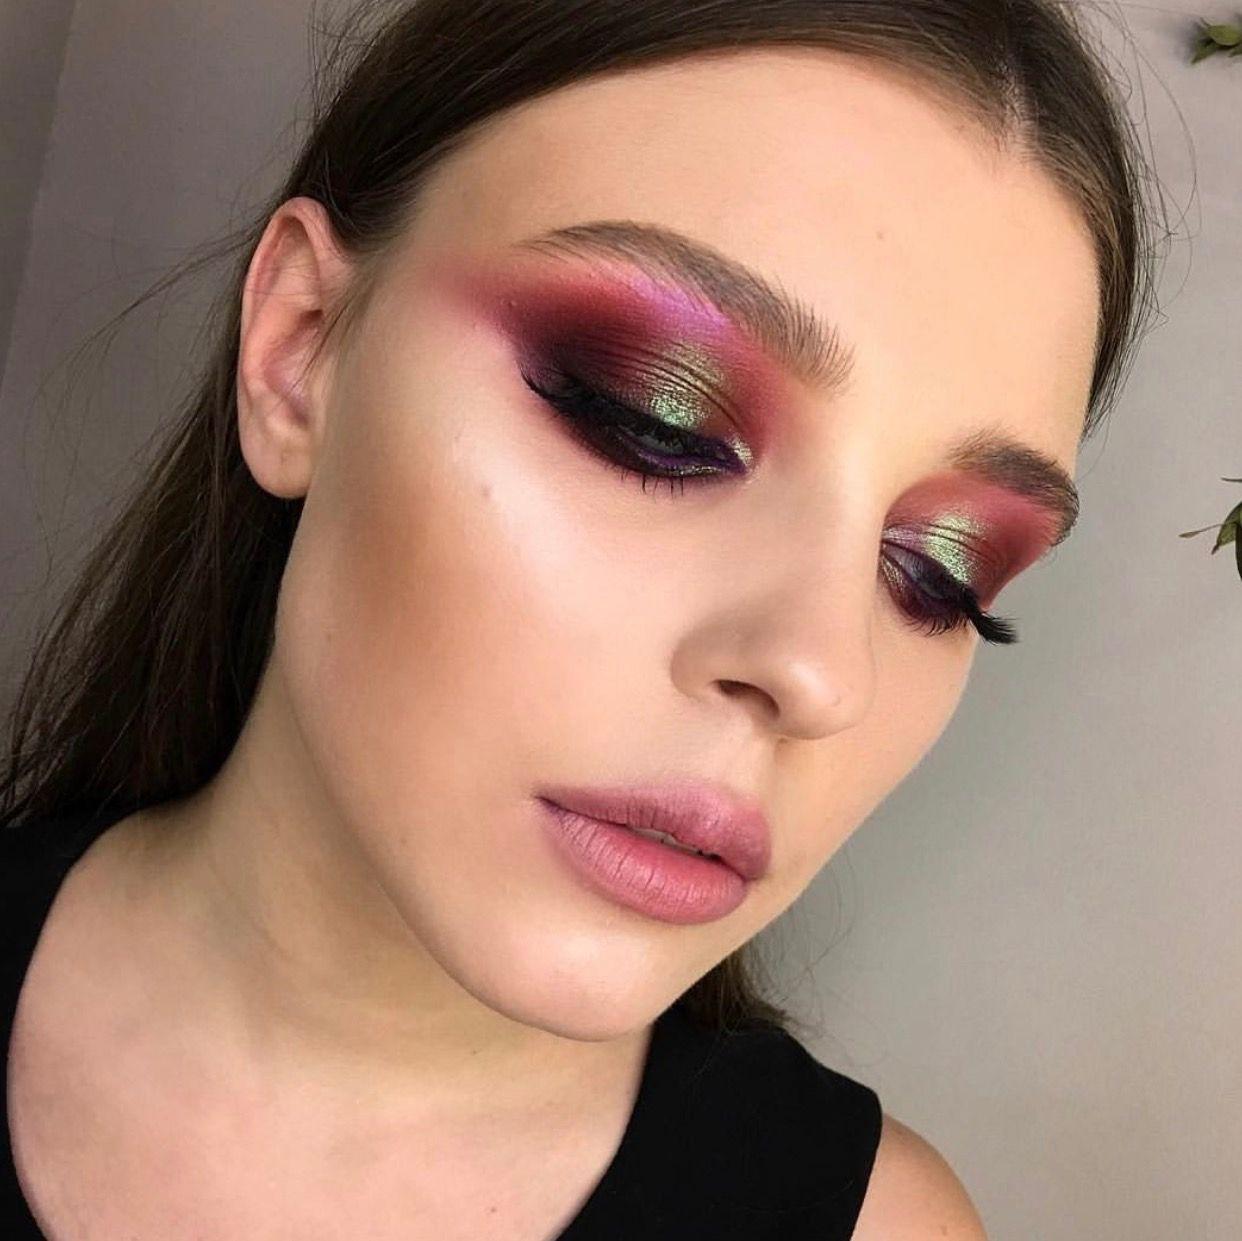 Pin by Karah Peters on MU LOOKS I ️ Burgundy eye makeup